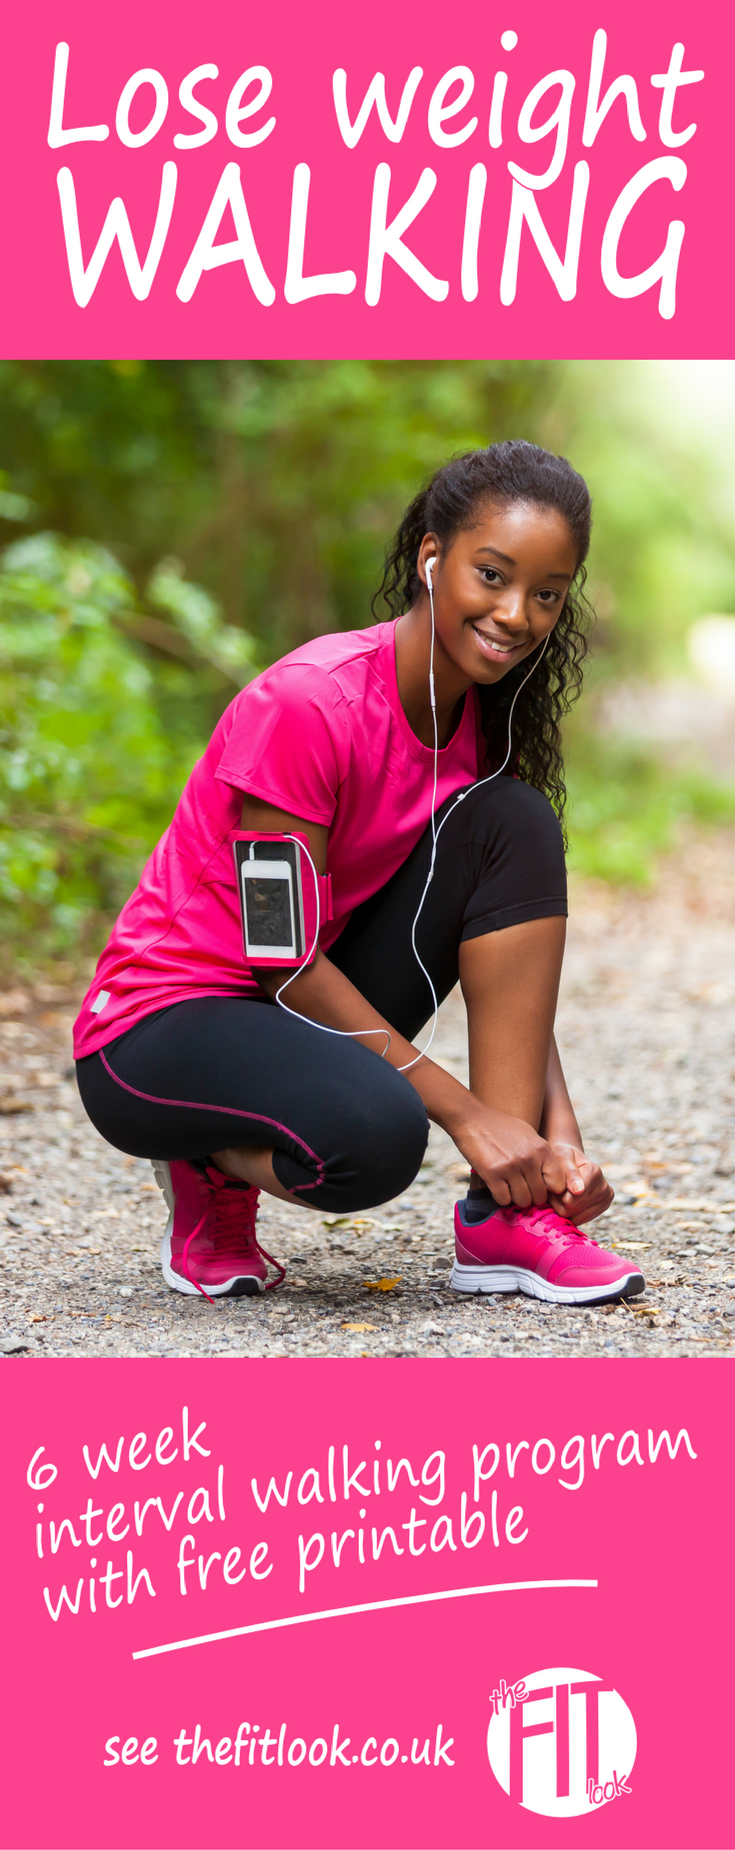 walk program to lose weight photo - 1